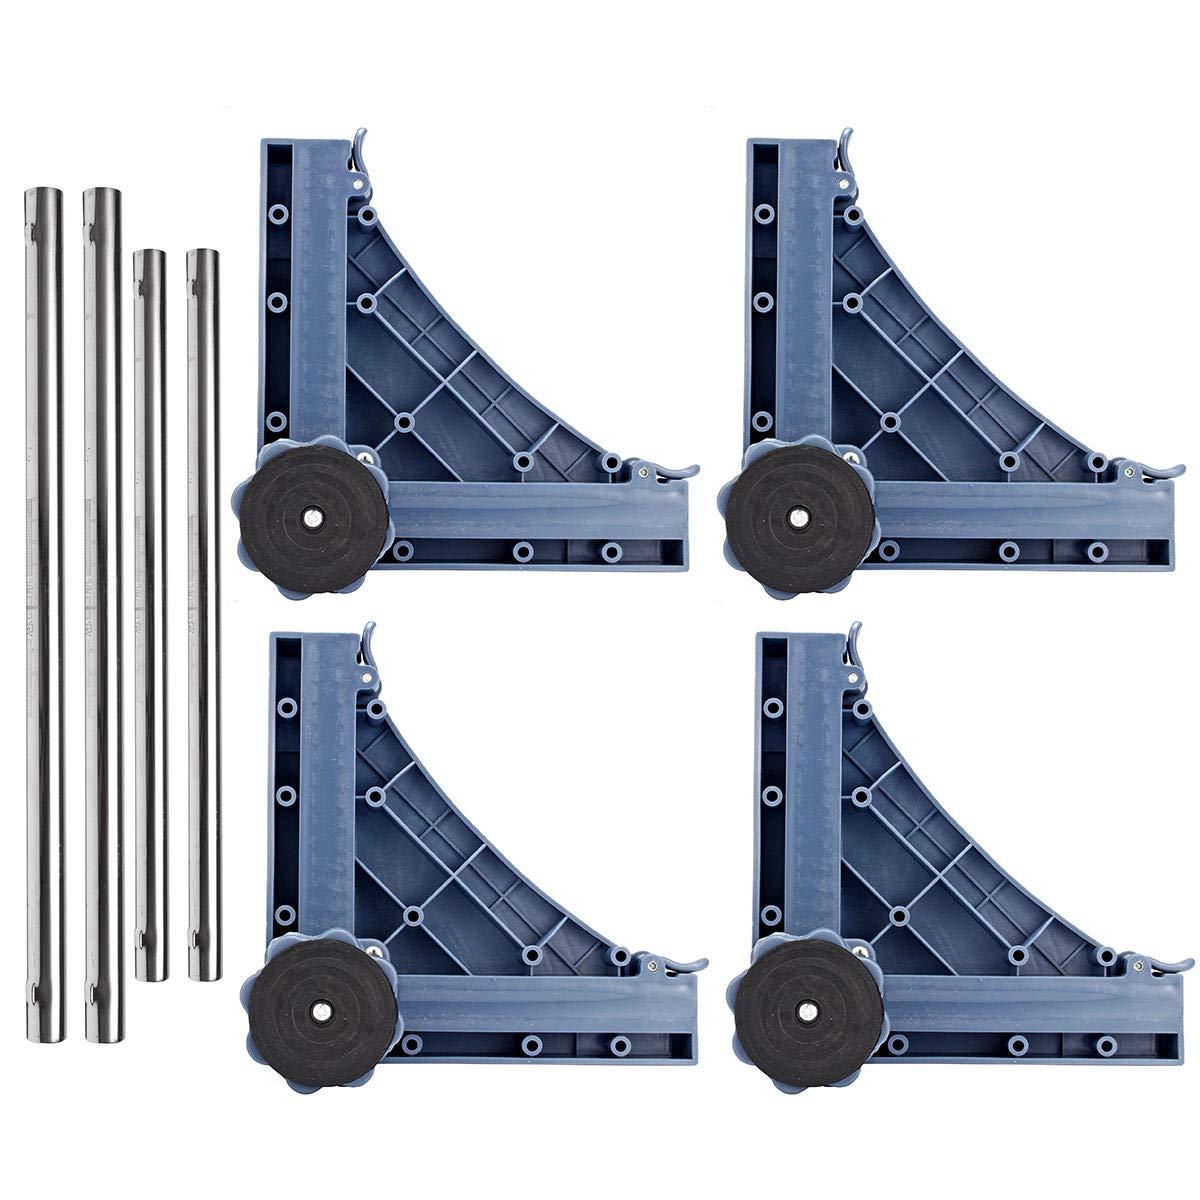 Refrigerator Undercarriage Bracket Stand Adjustable - 1PCs